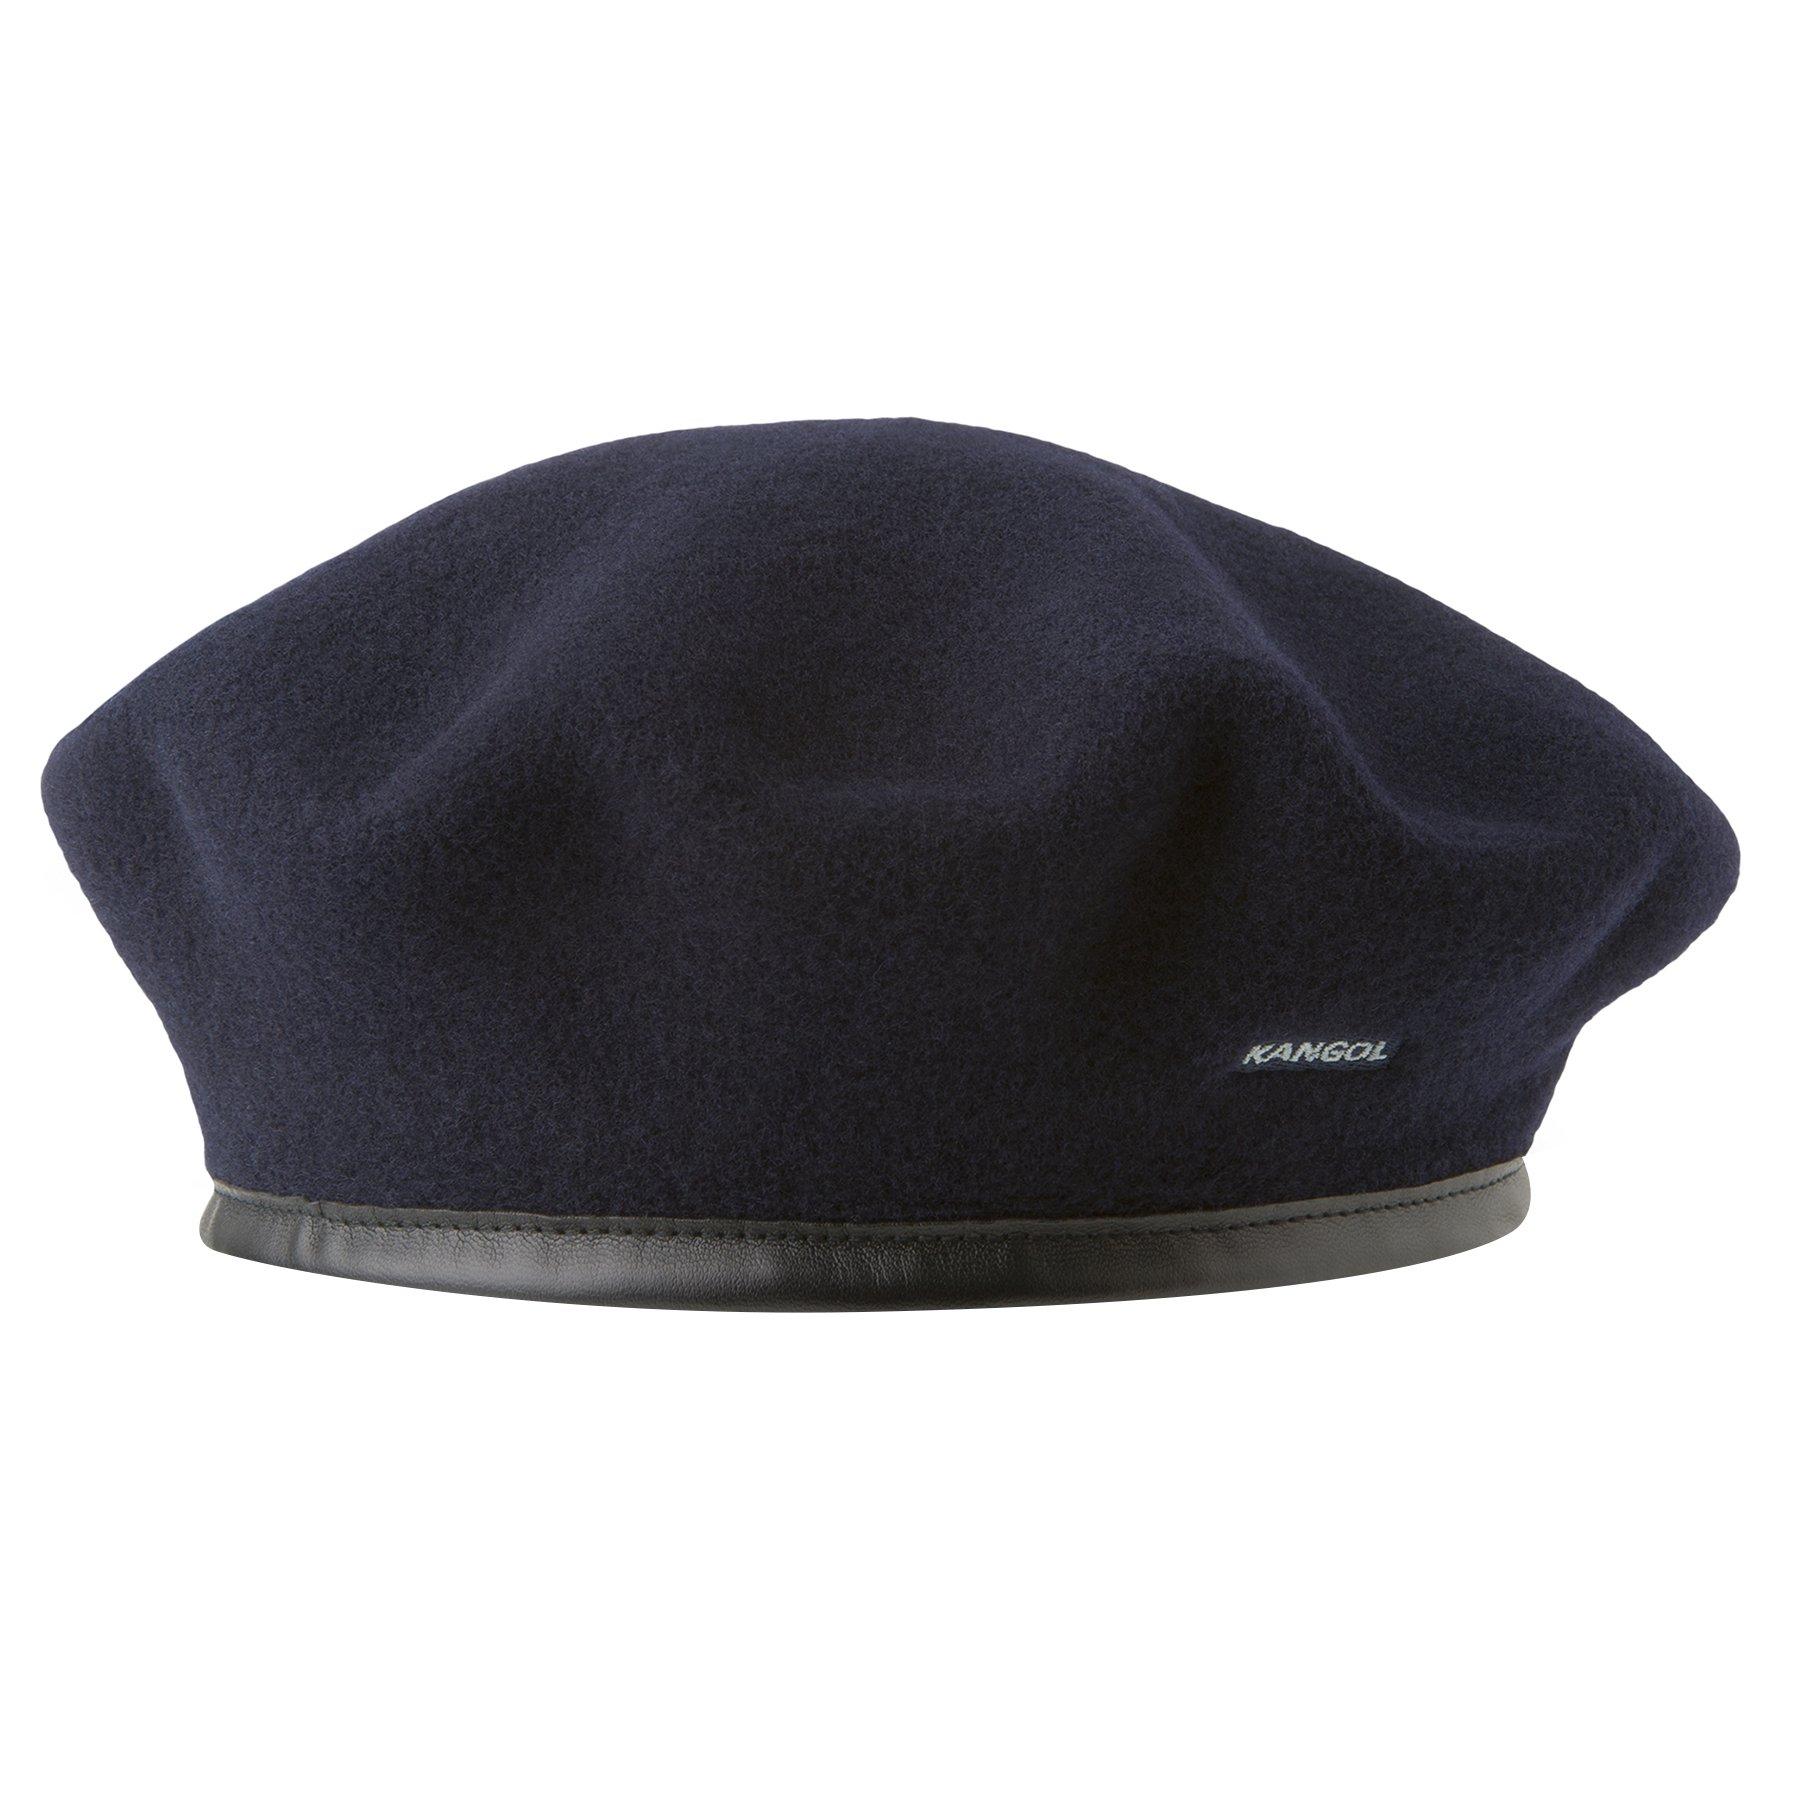 Kangol Classic Monty Beret, The Original Beret, Dark Blue (Small)